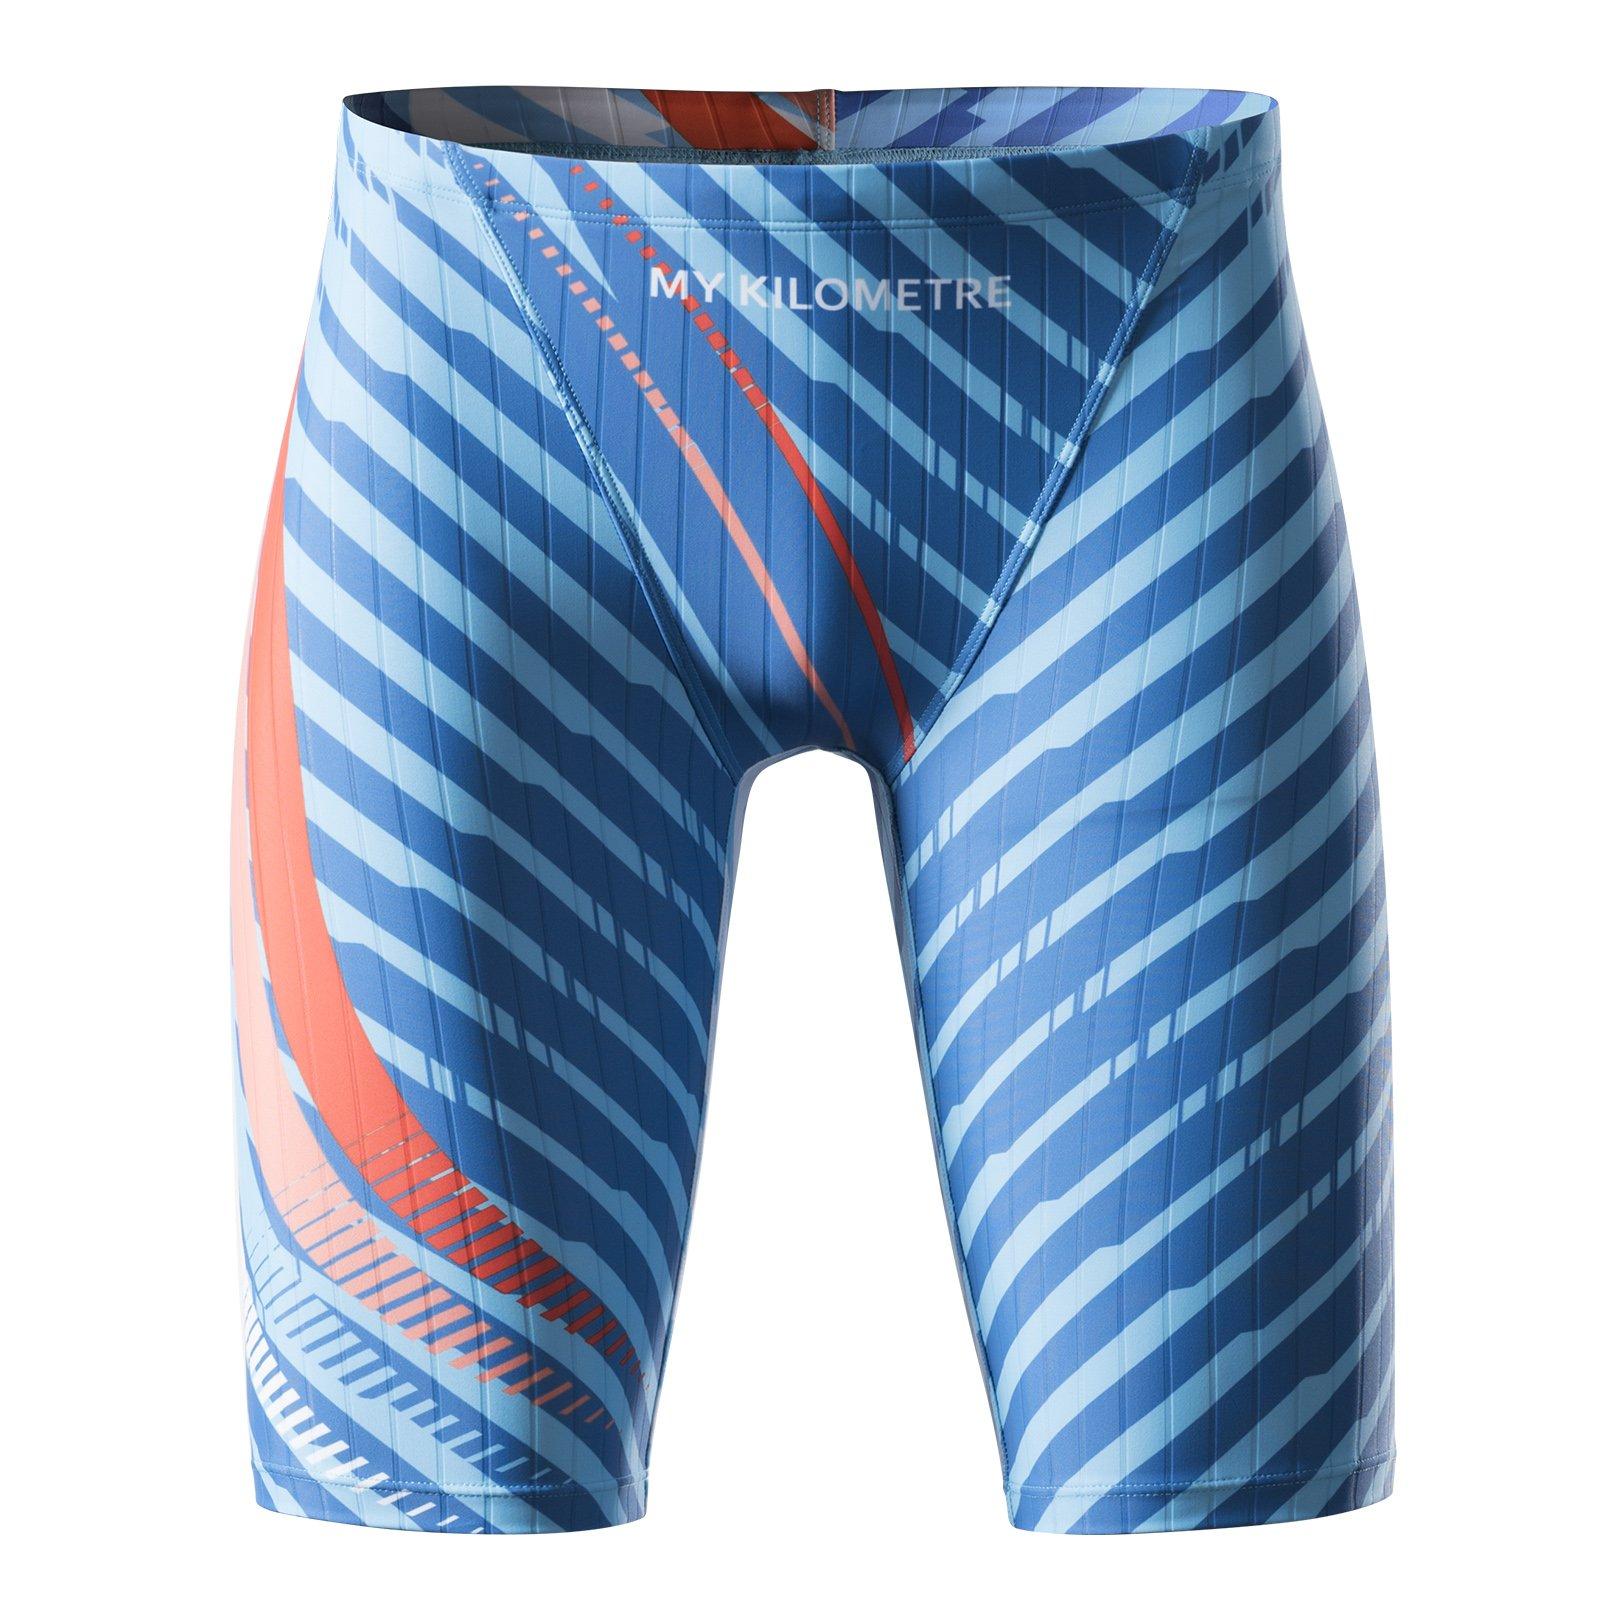 MY KILOMETRE Men's Swim Jammers – Quick-Dry Swimsuit – Chlorine Resistant(L Blue)